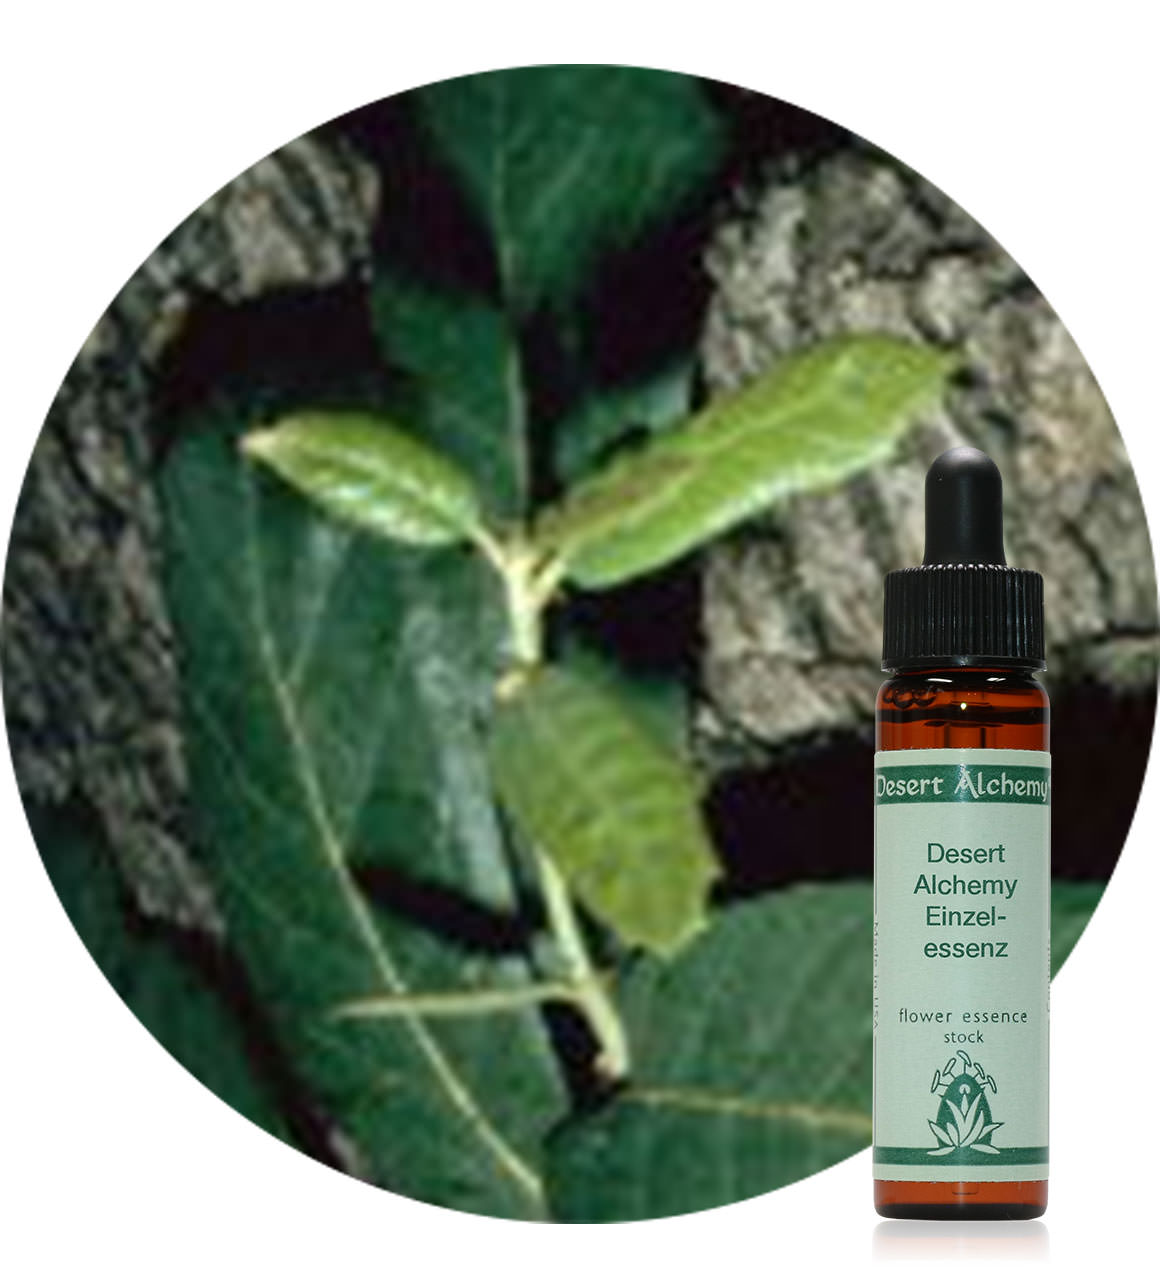 004. Arizona White Oak